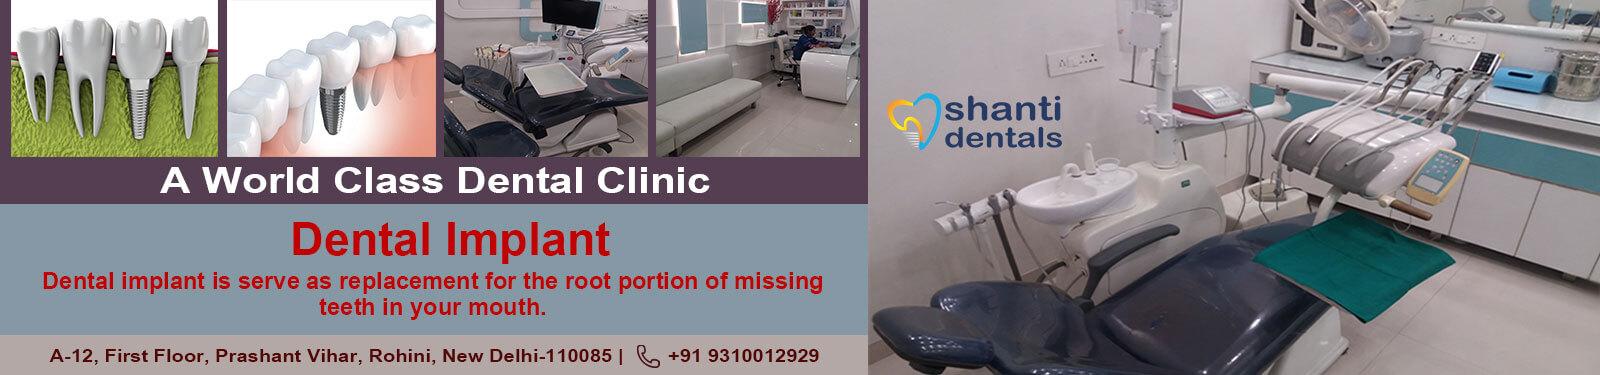 Dental Implant Care in Rohini Delhi by Shanti Dentals